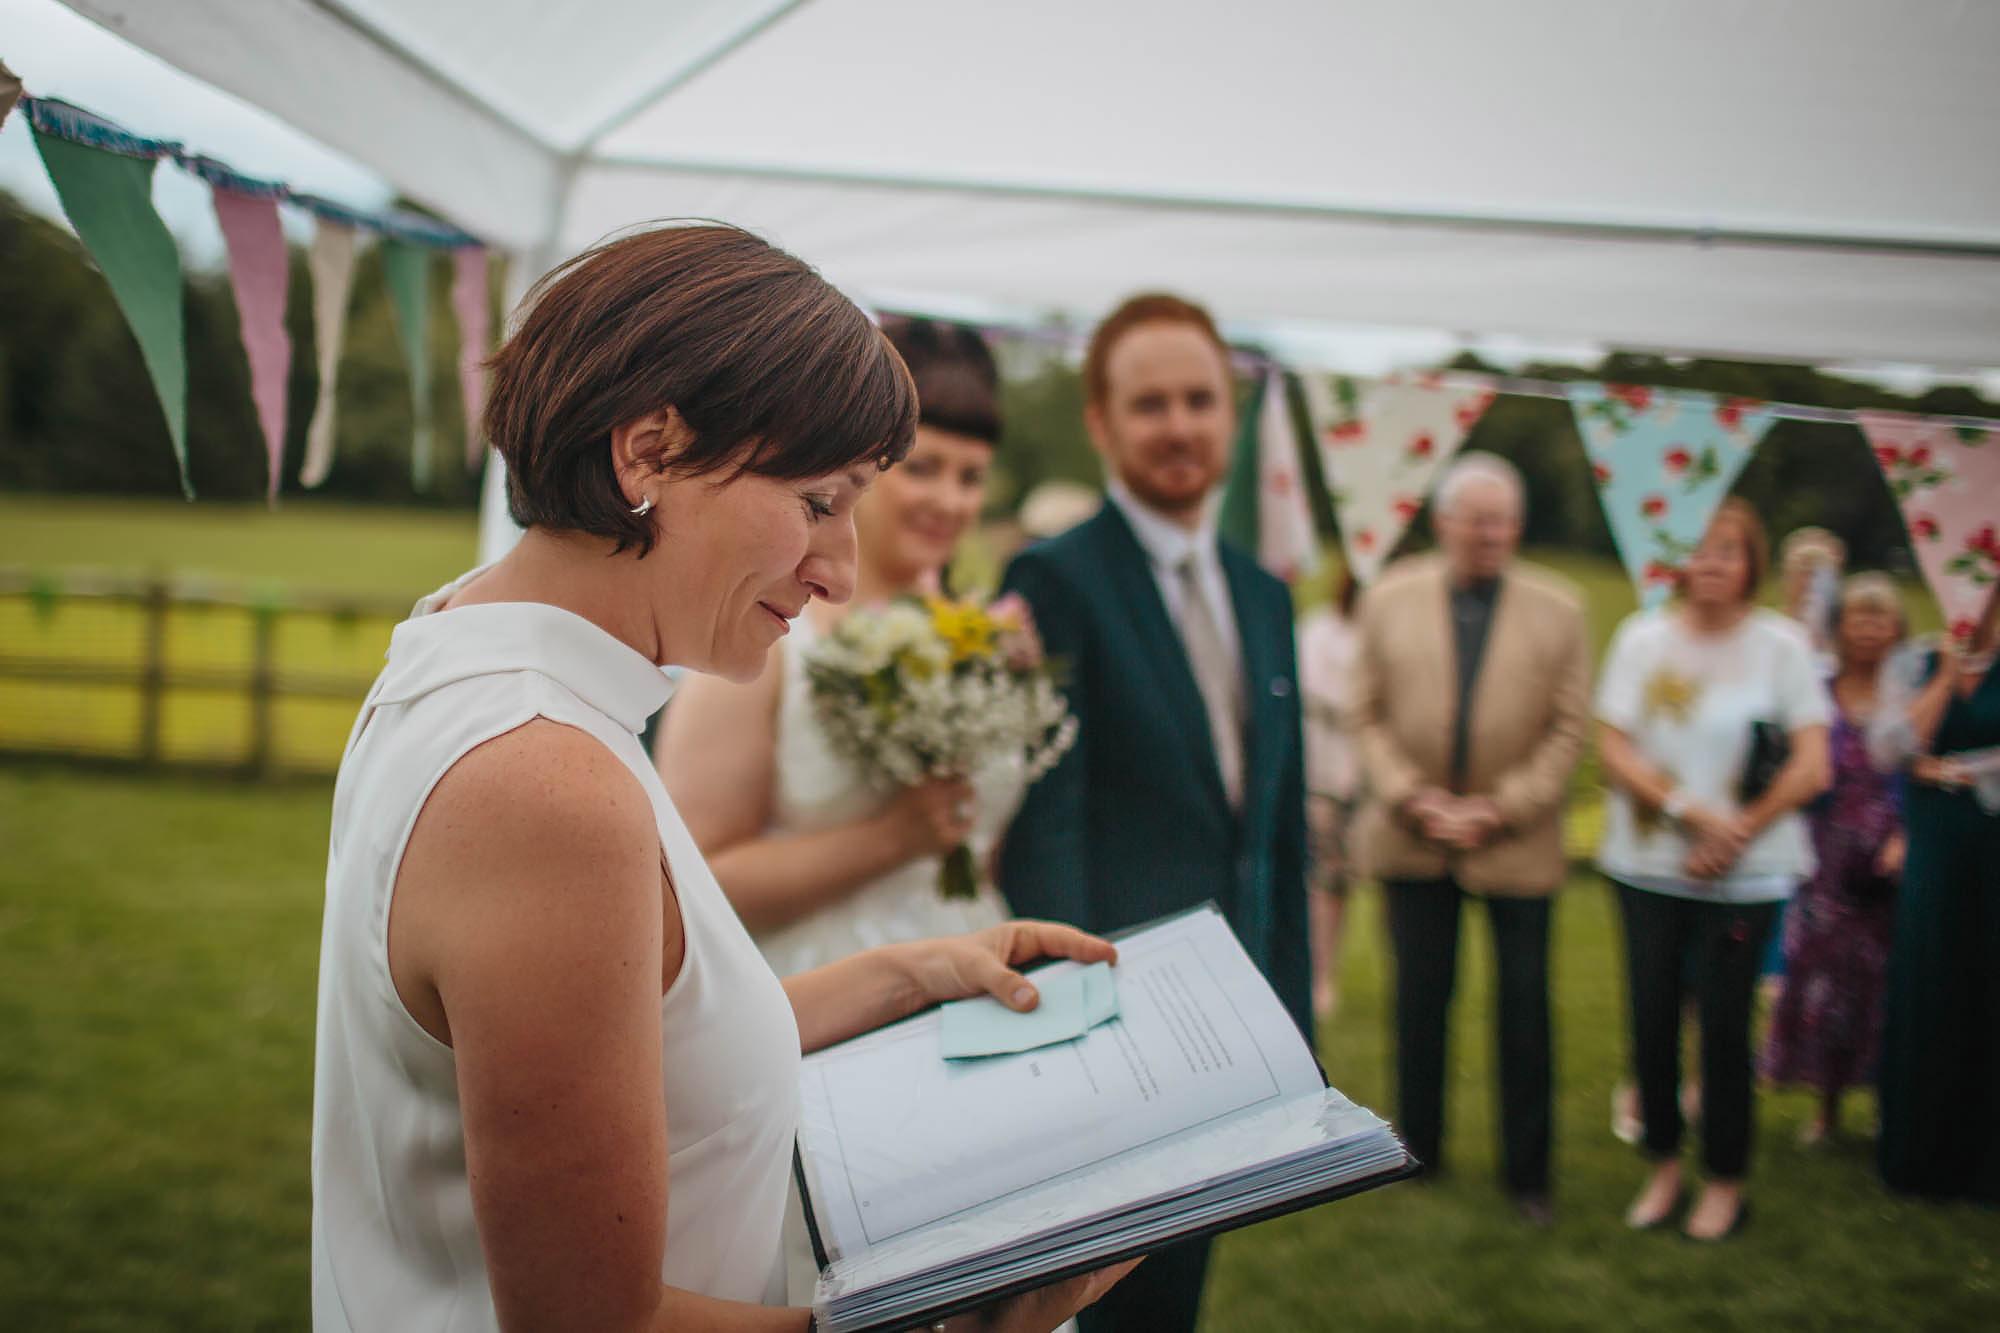 Leeds Yorkshire Wedding Photographer Speaker Speech Sister